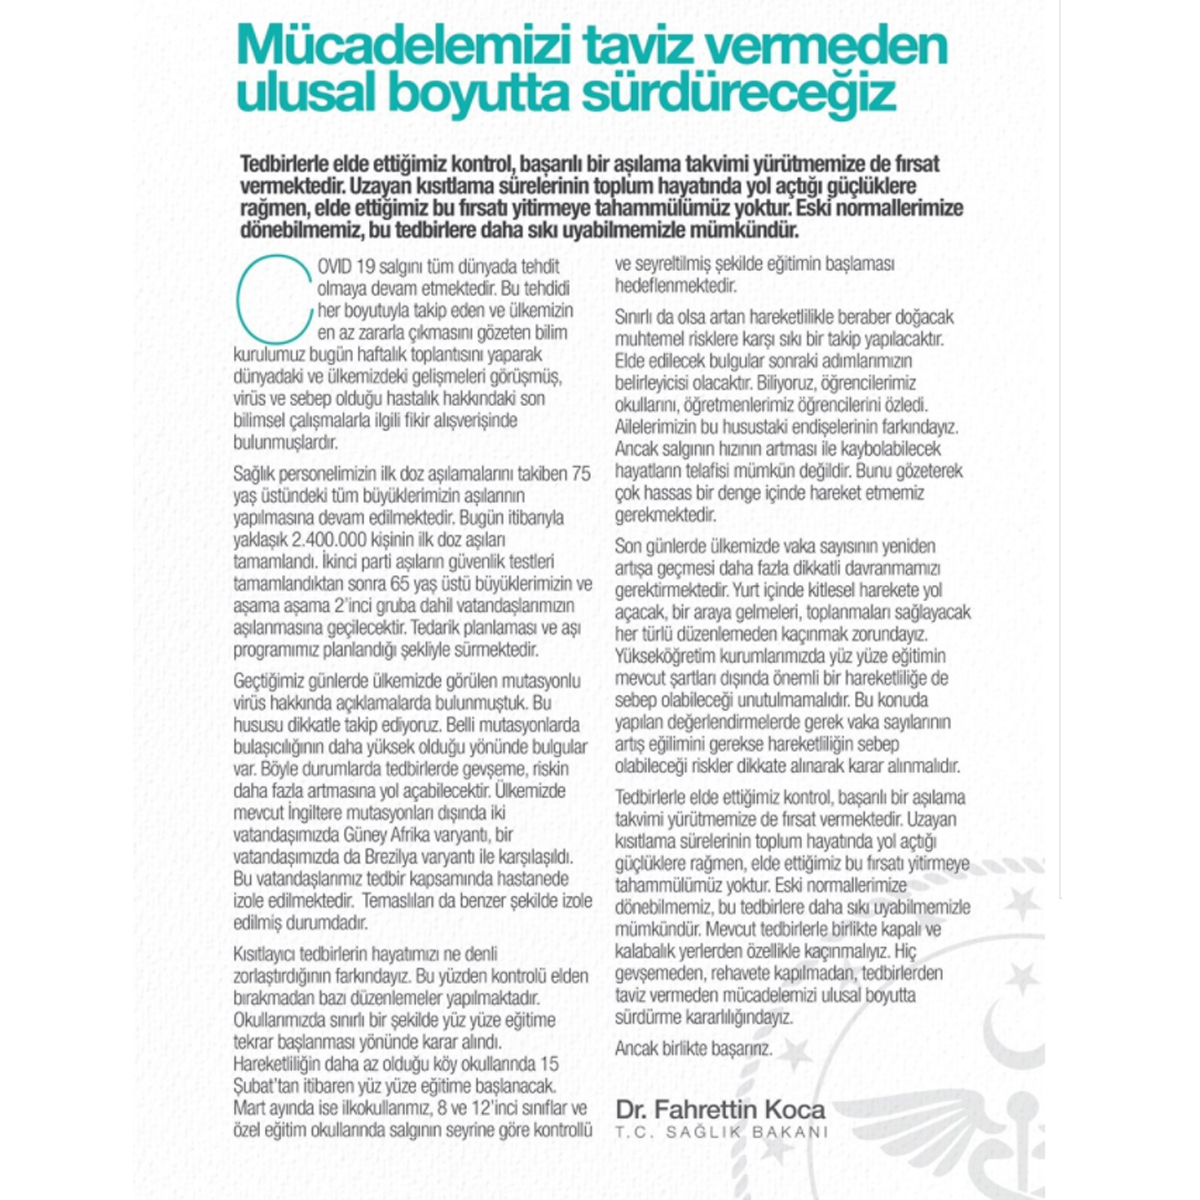 ozgur_gazete_kibris_SON_DAKİKA_G_Afrika_mutasyonu_Turkiye_de1